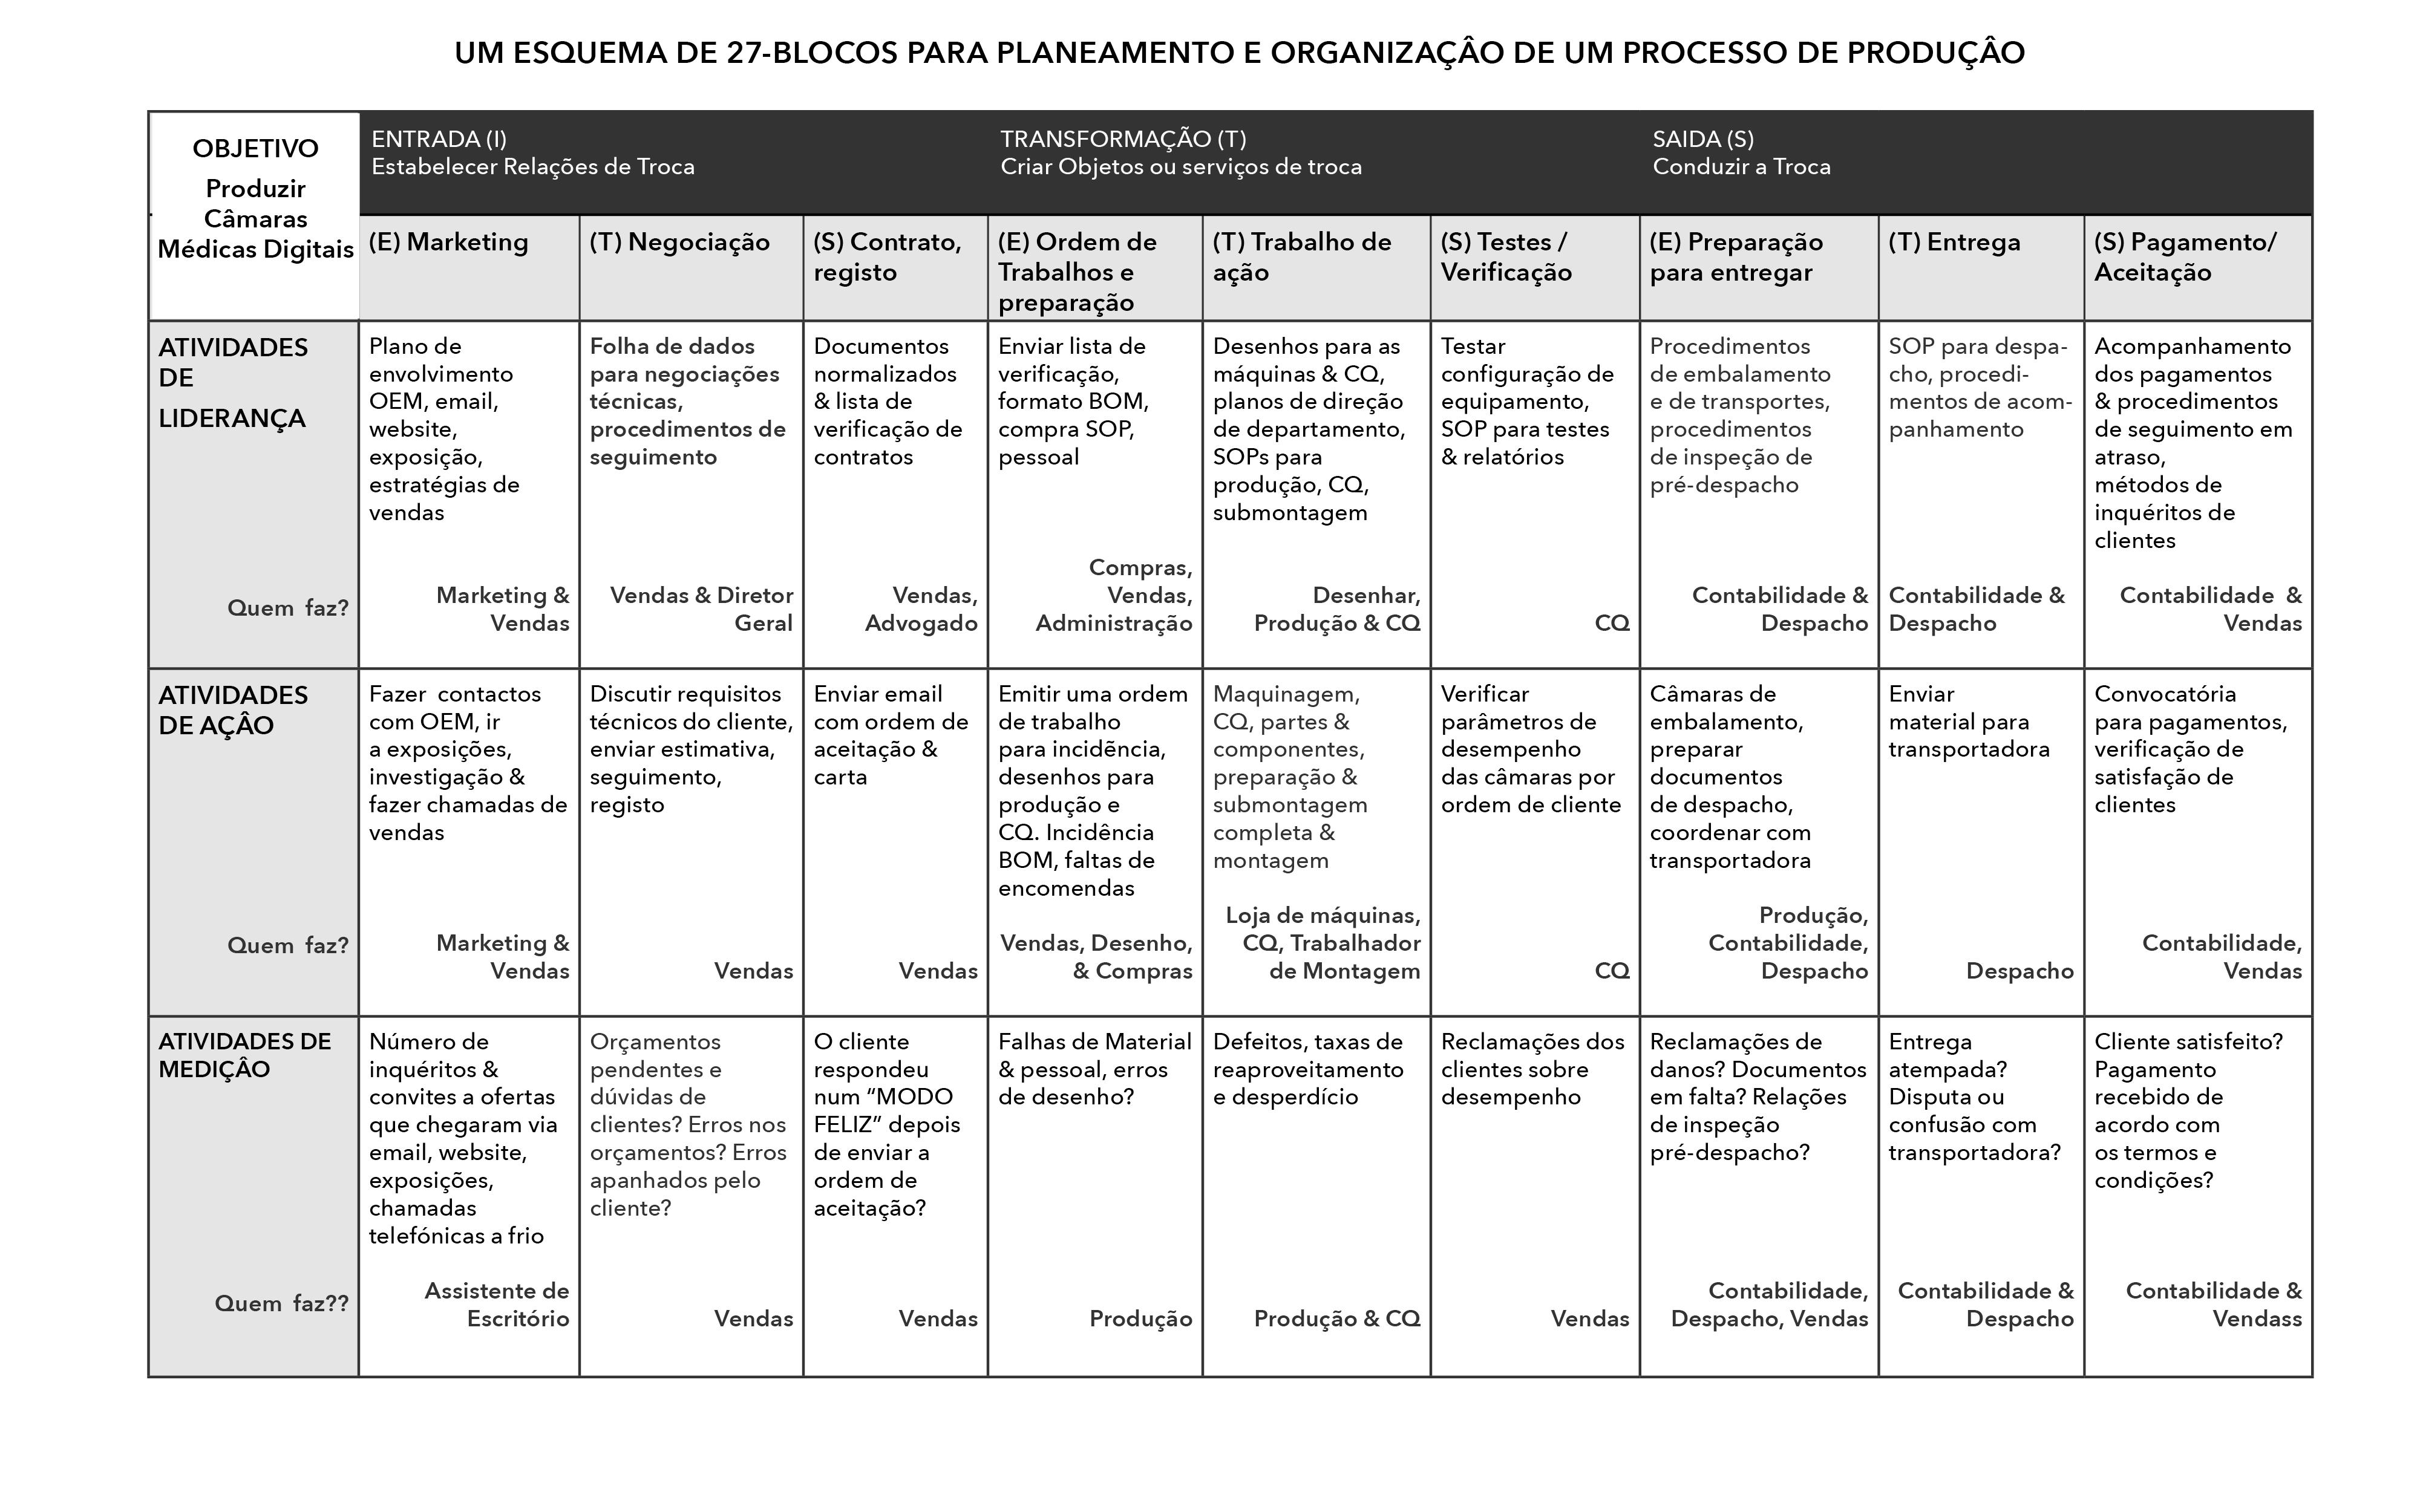 27-block Planning Chart